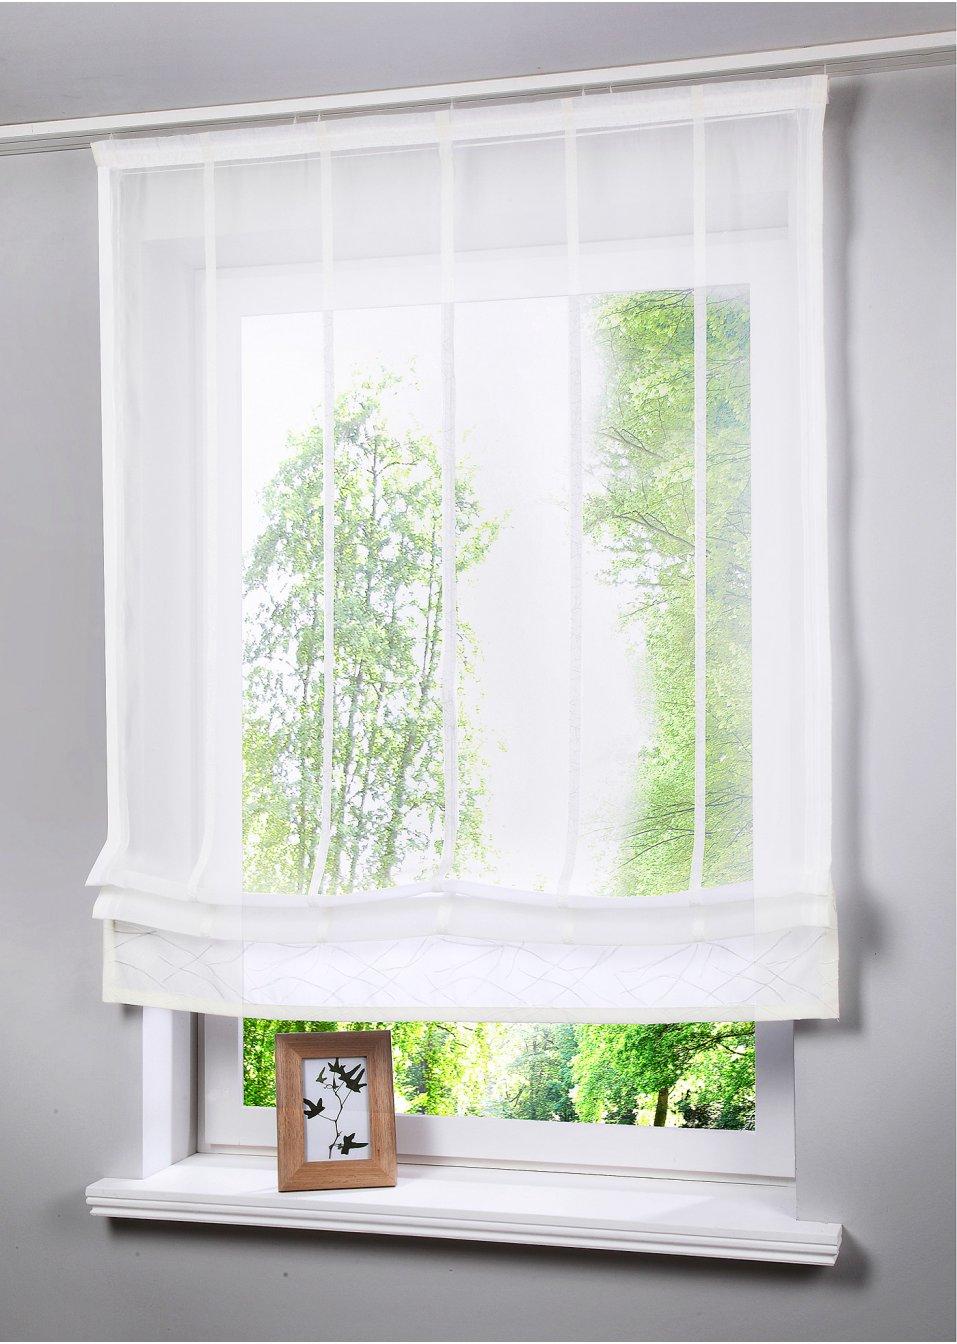 raffrollo mare klettschiene creme bpc living online. Black Bedroom Furniture Sets. Home Design Ideas